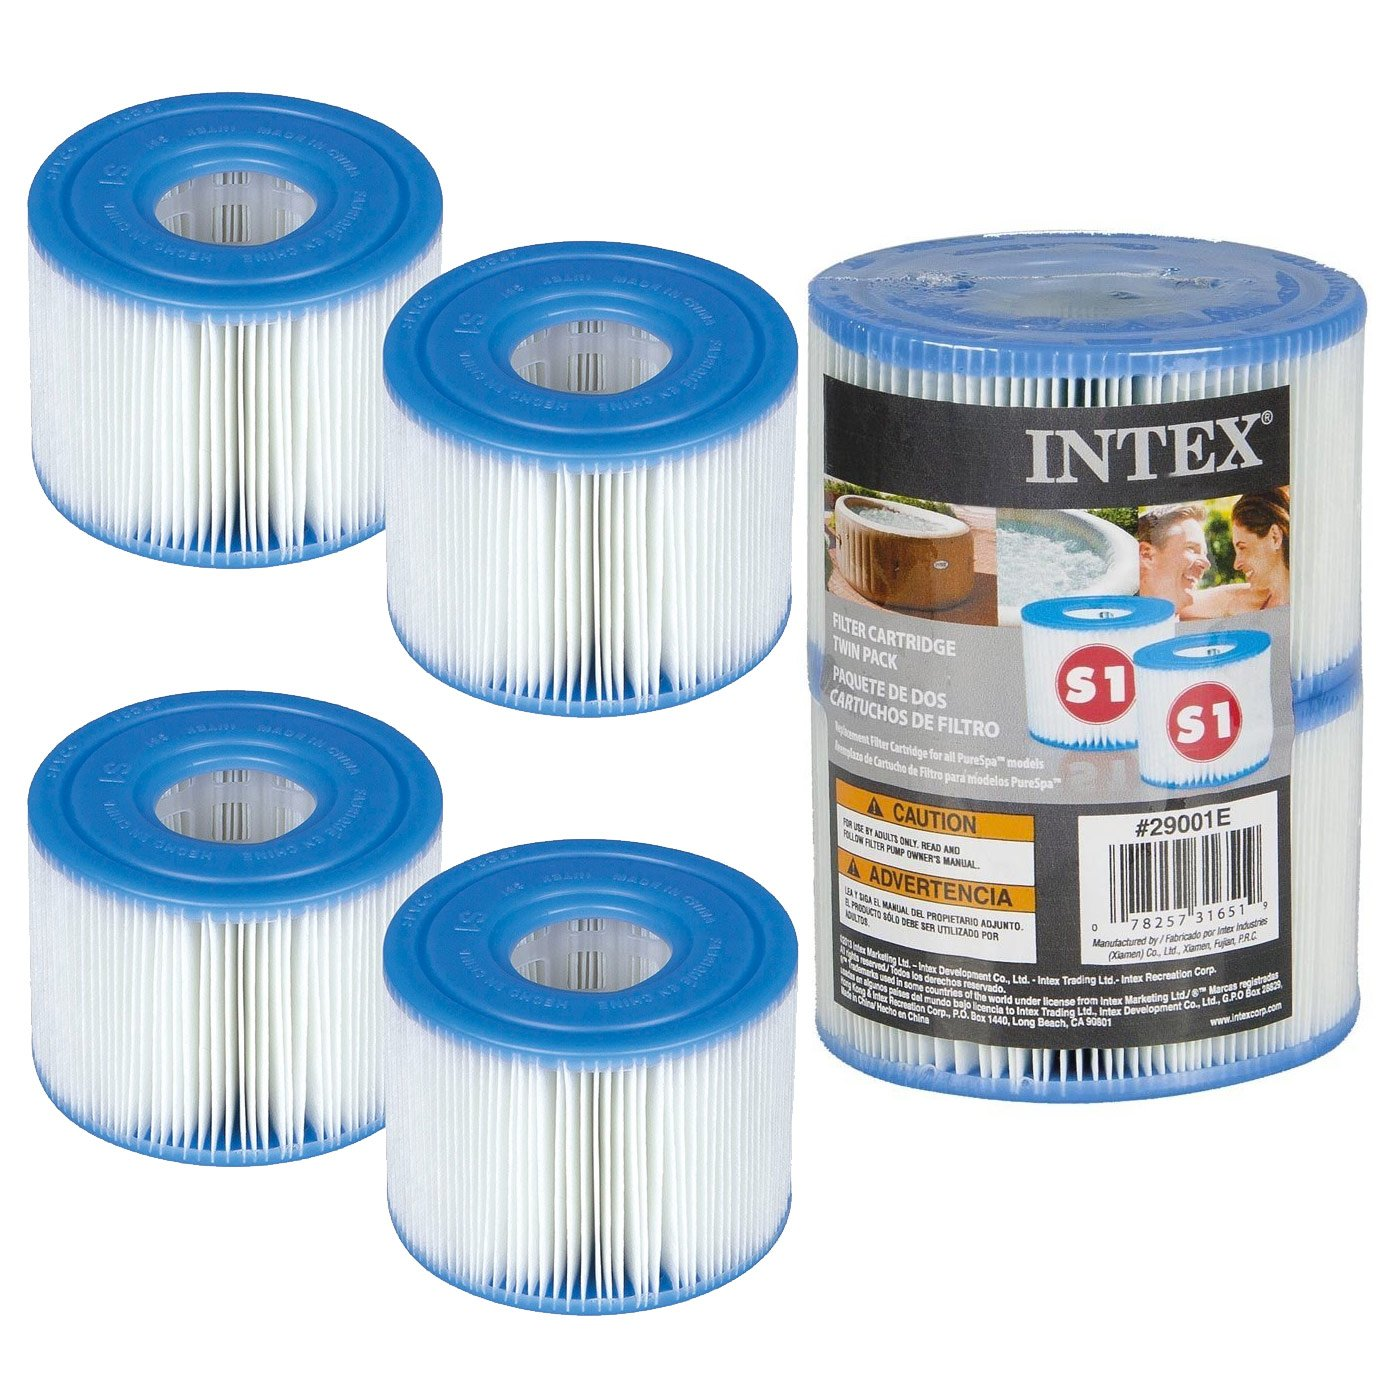 4 Intex Filter Cartridges for Spa Filter - Intex Type S1 Générique